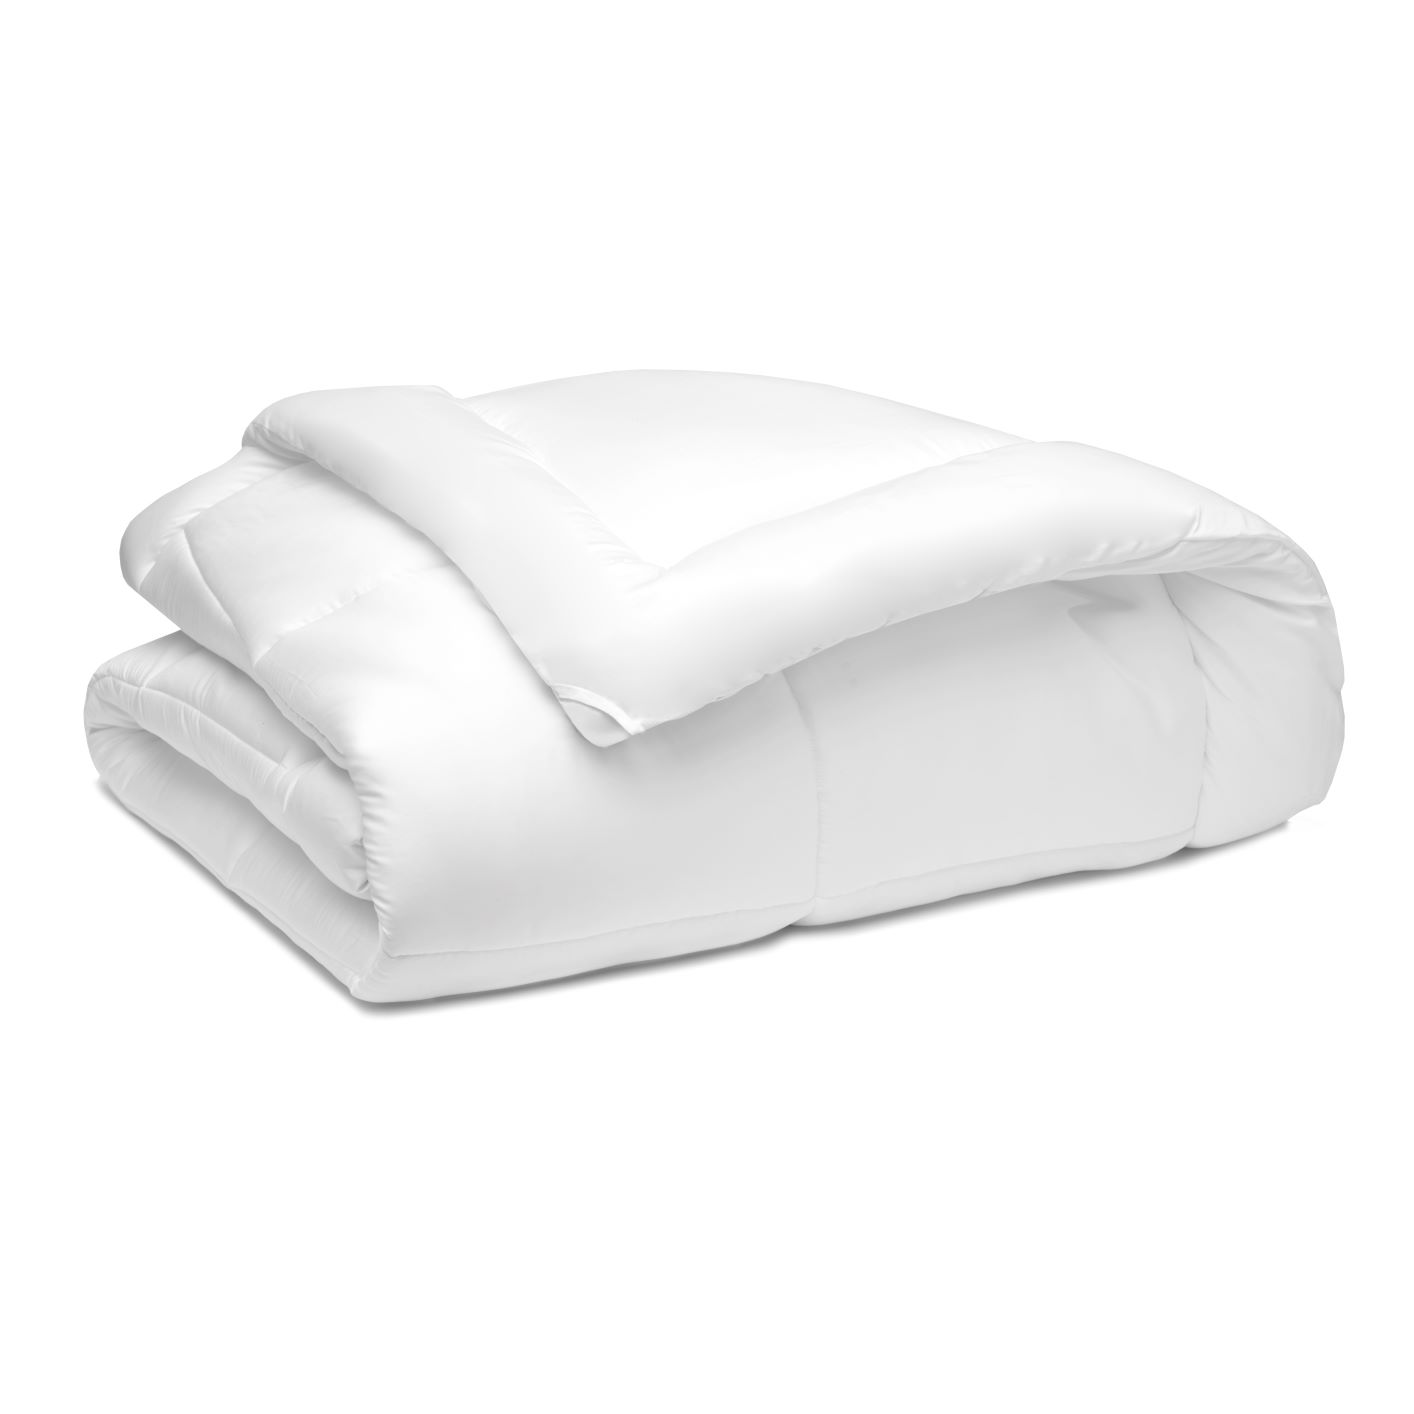 Therapedic® SleepRX™ Down Alternative Comforter